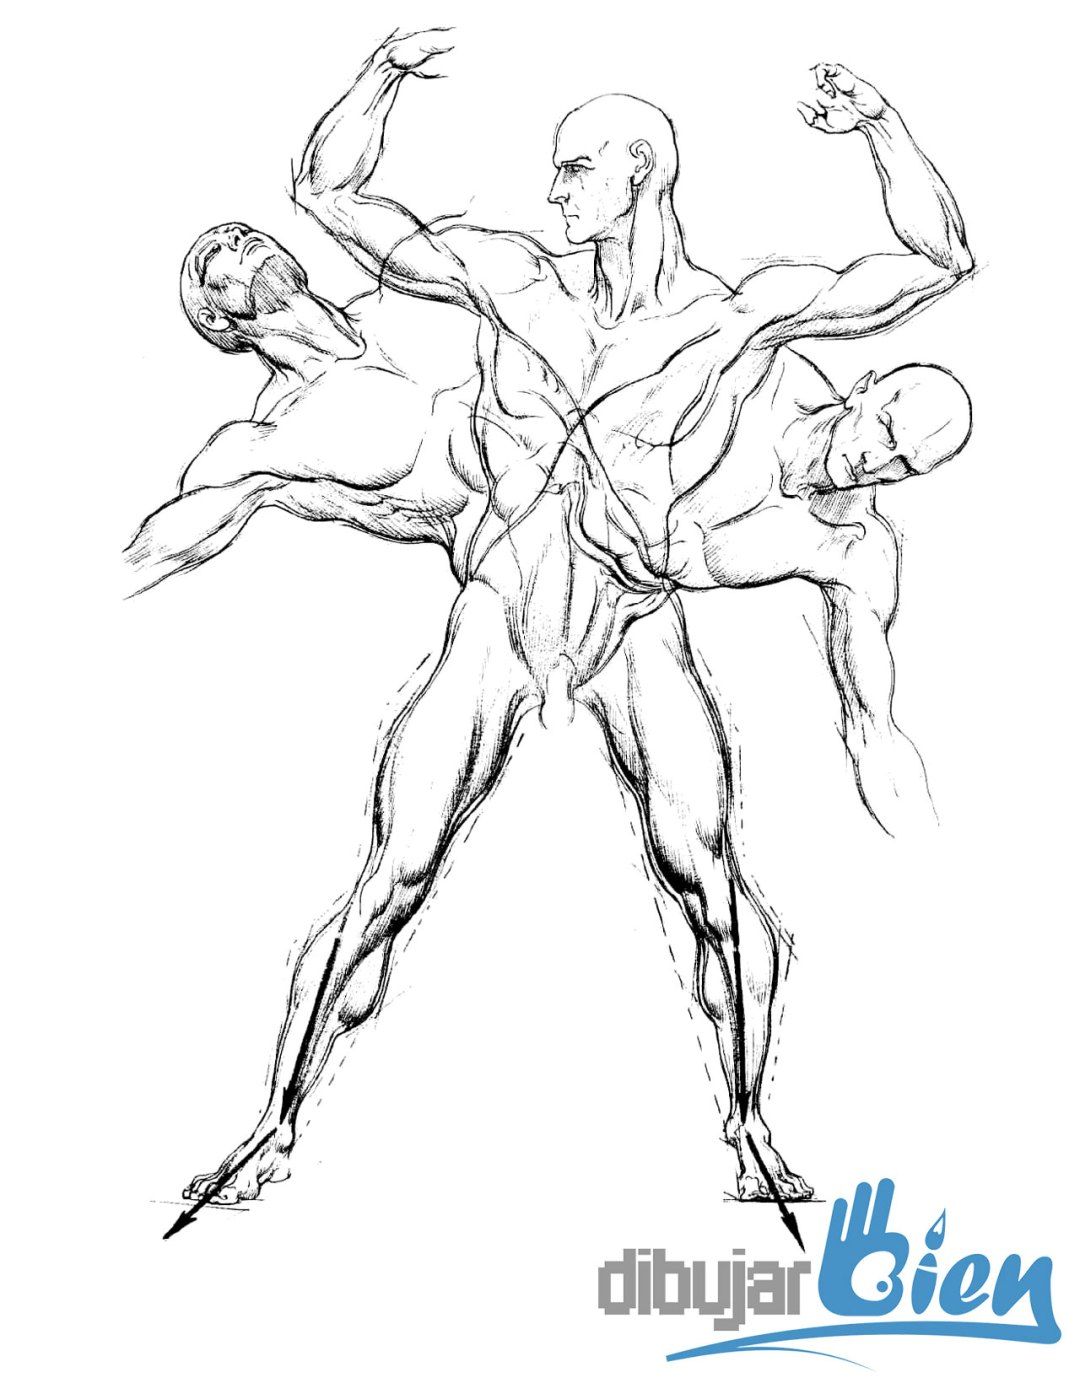 Libros para dibujar anatomía: Burne Hogarth